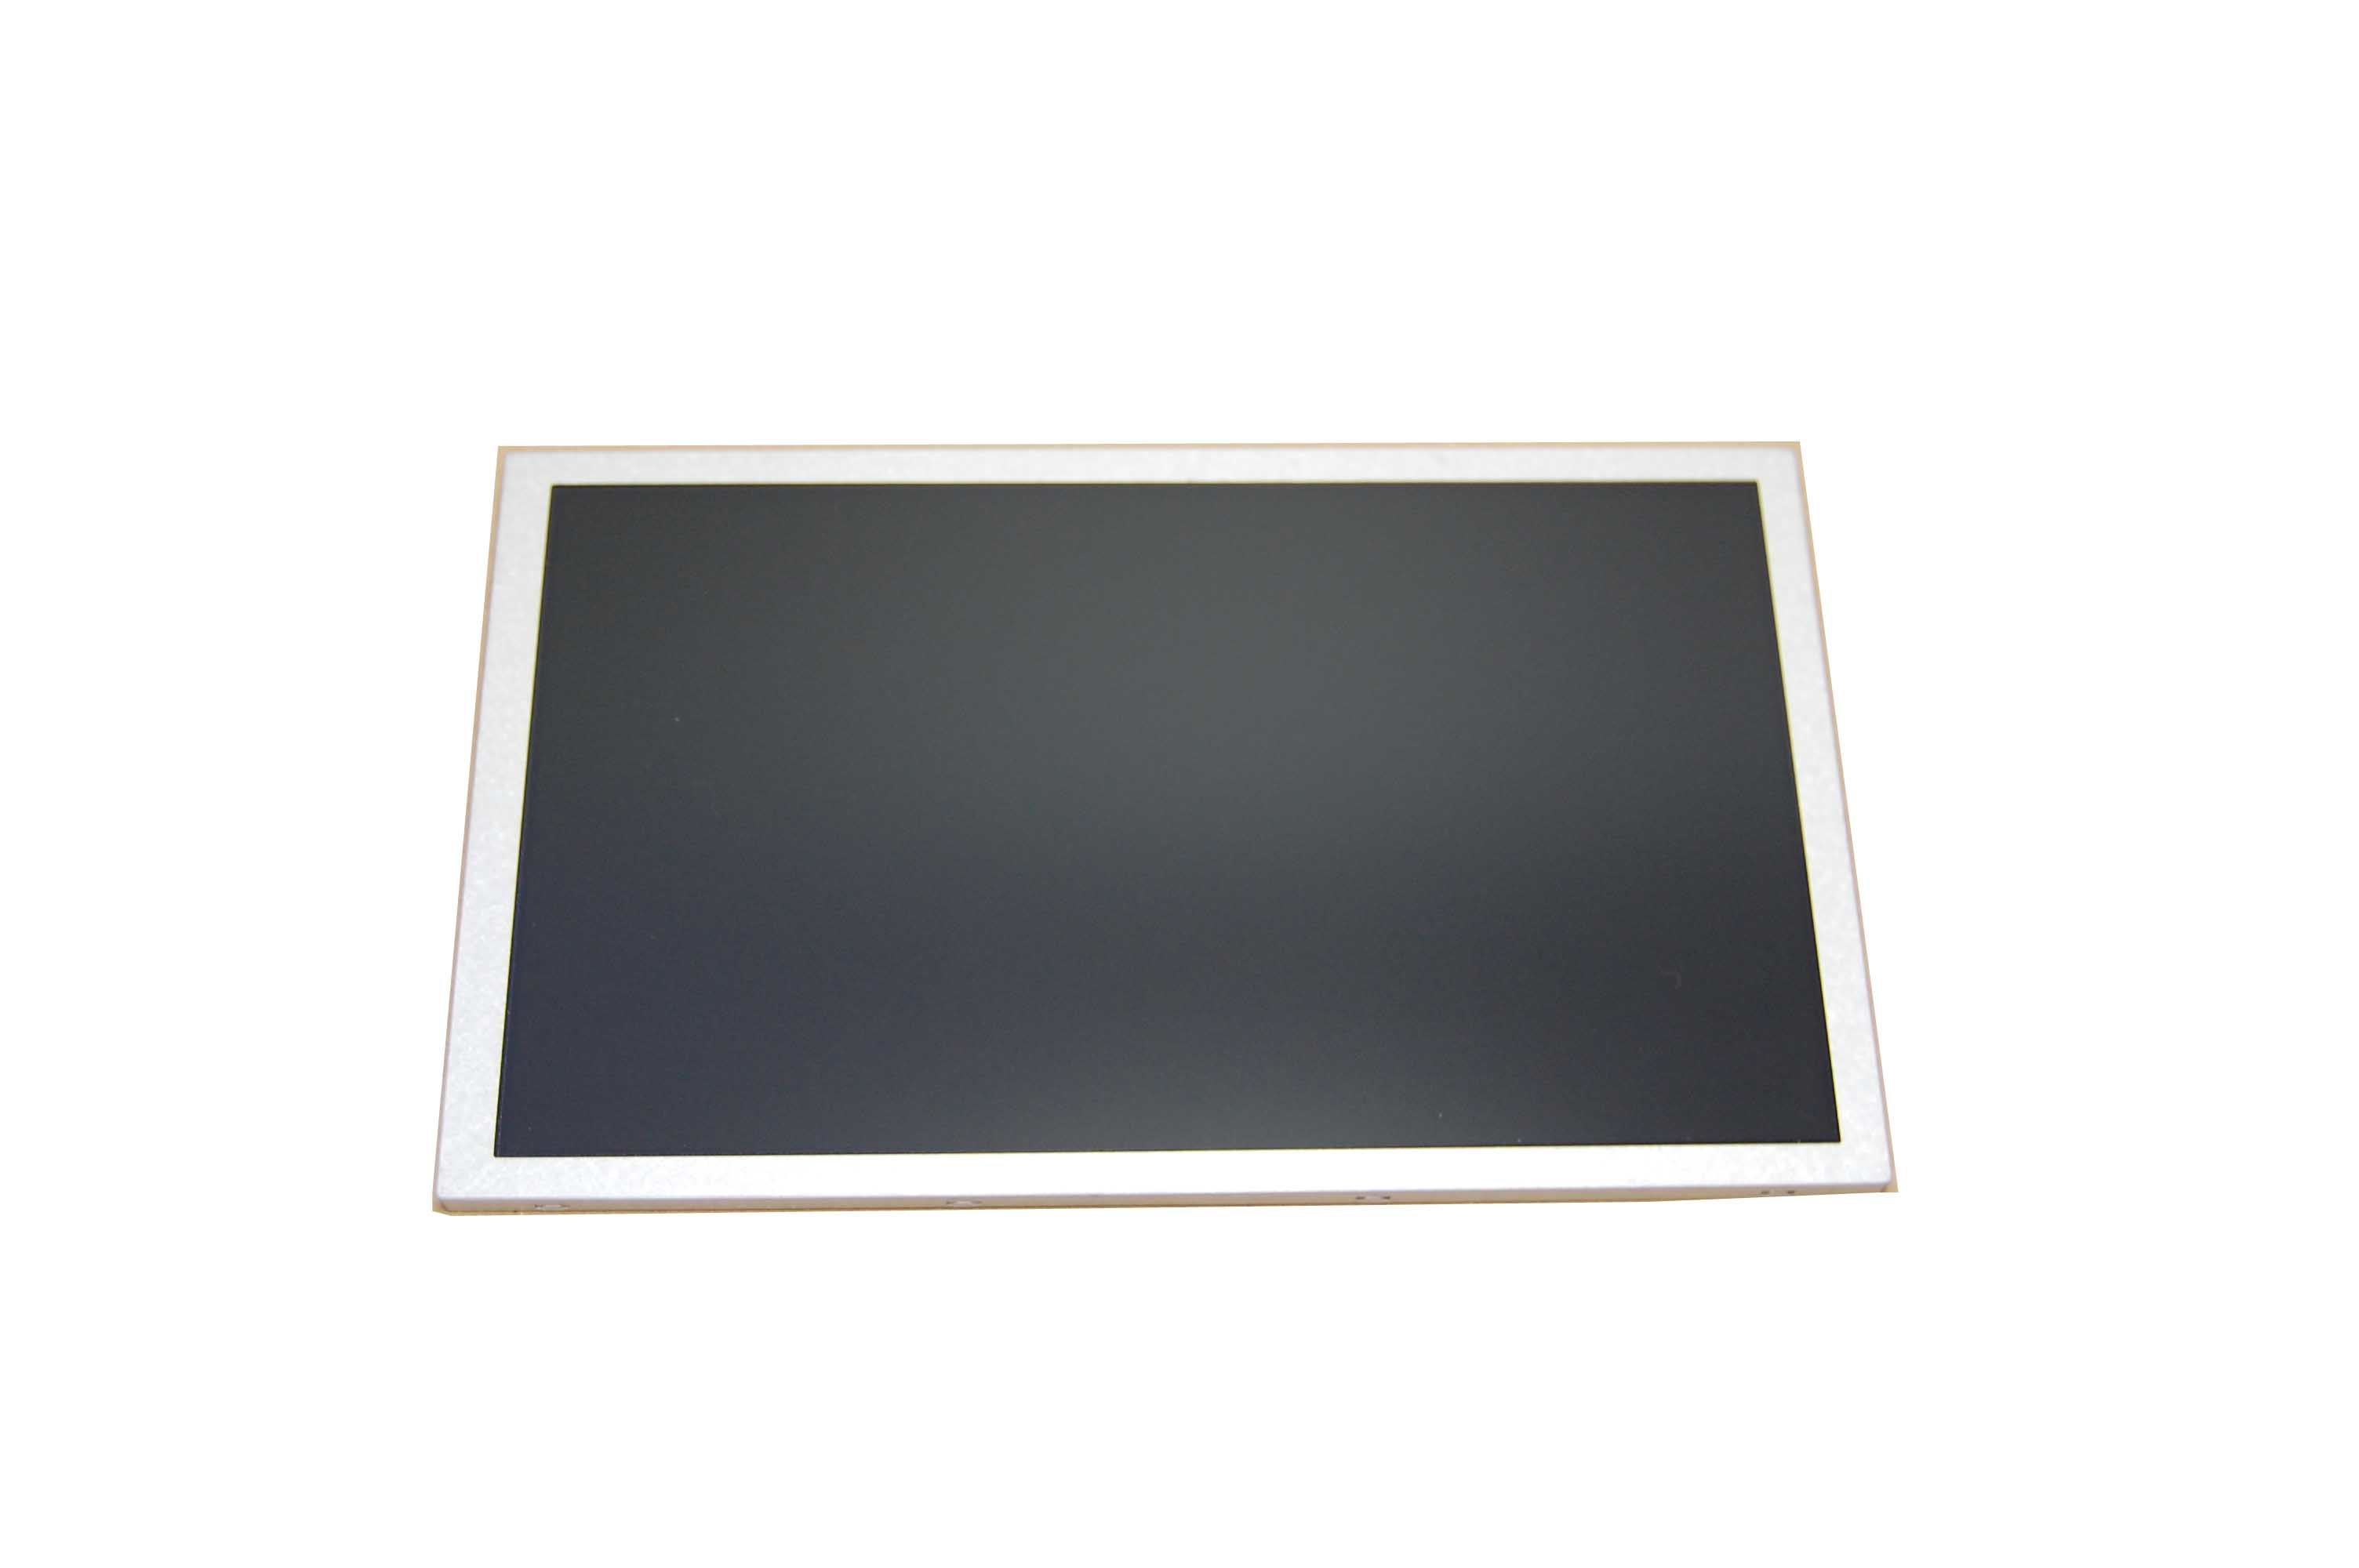 "HannStar HSD089IFW1-A00 Display LCD 8,9"" 1024x600 LED matt"